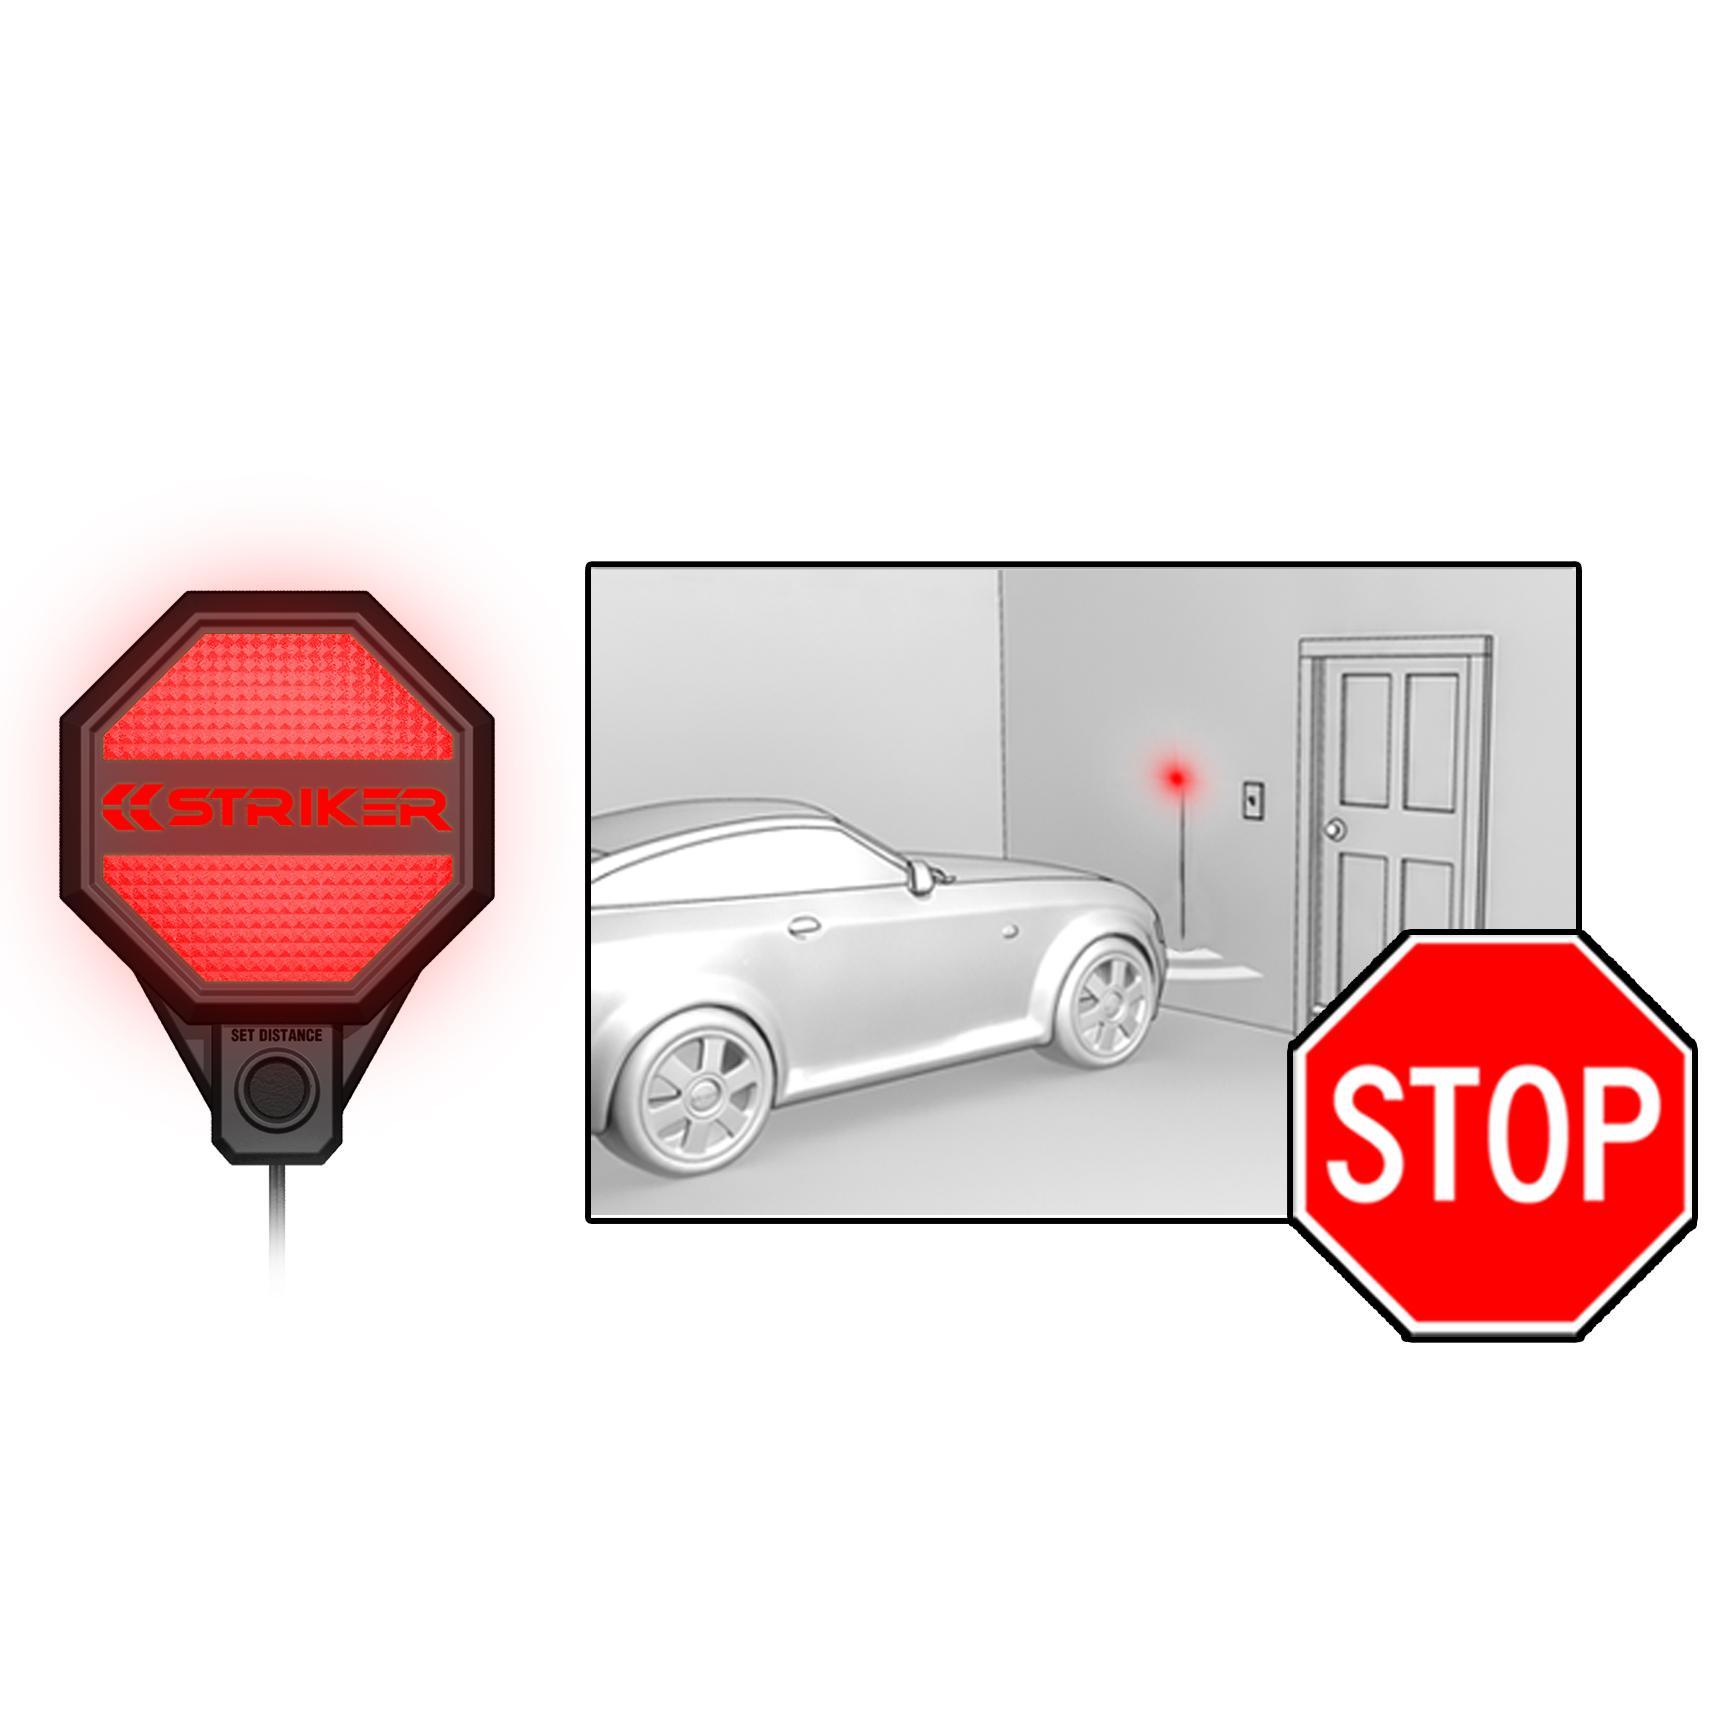 Garage Traffic Lights: Amazon.com: Striker 00246 Garage Parking Sensor: Automotive